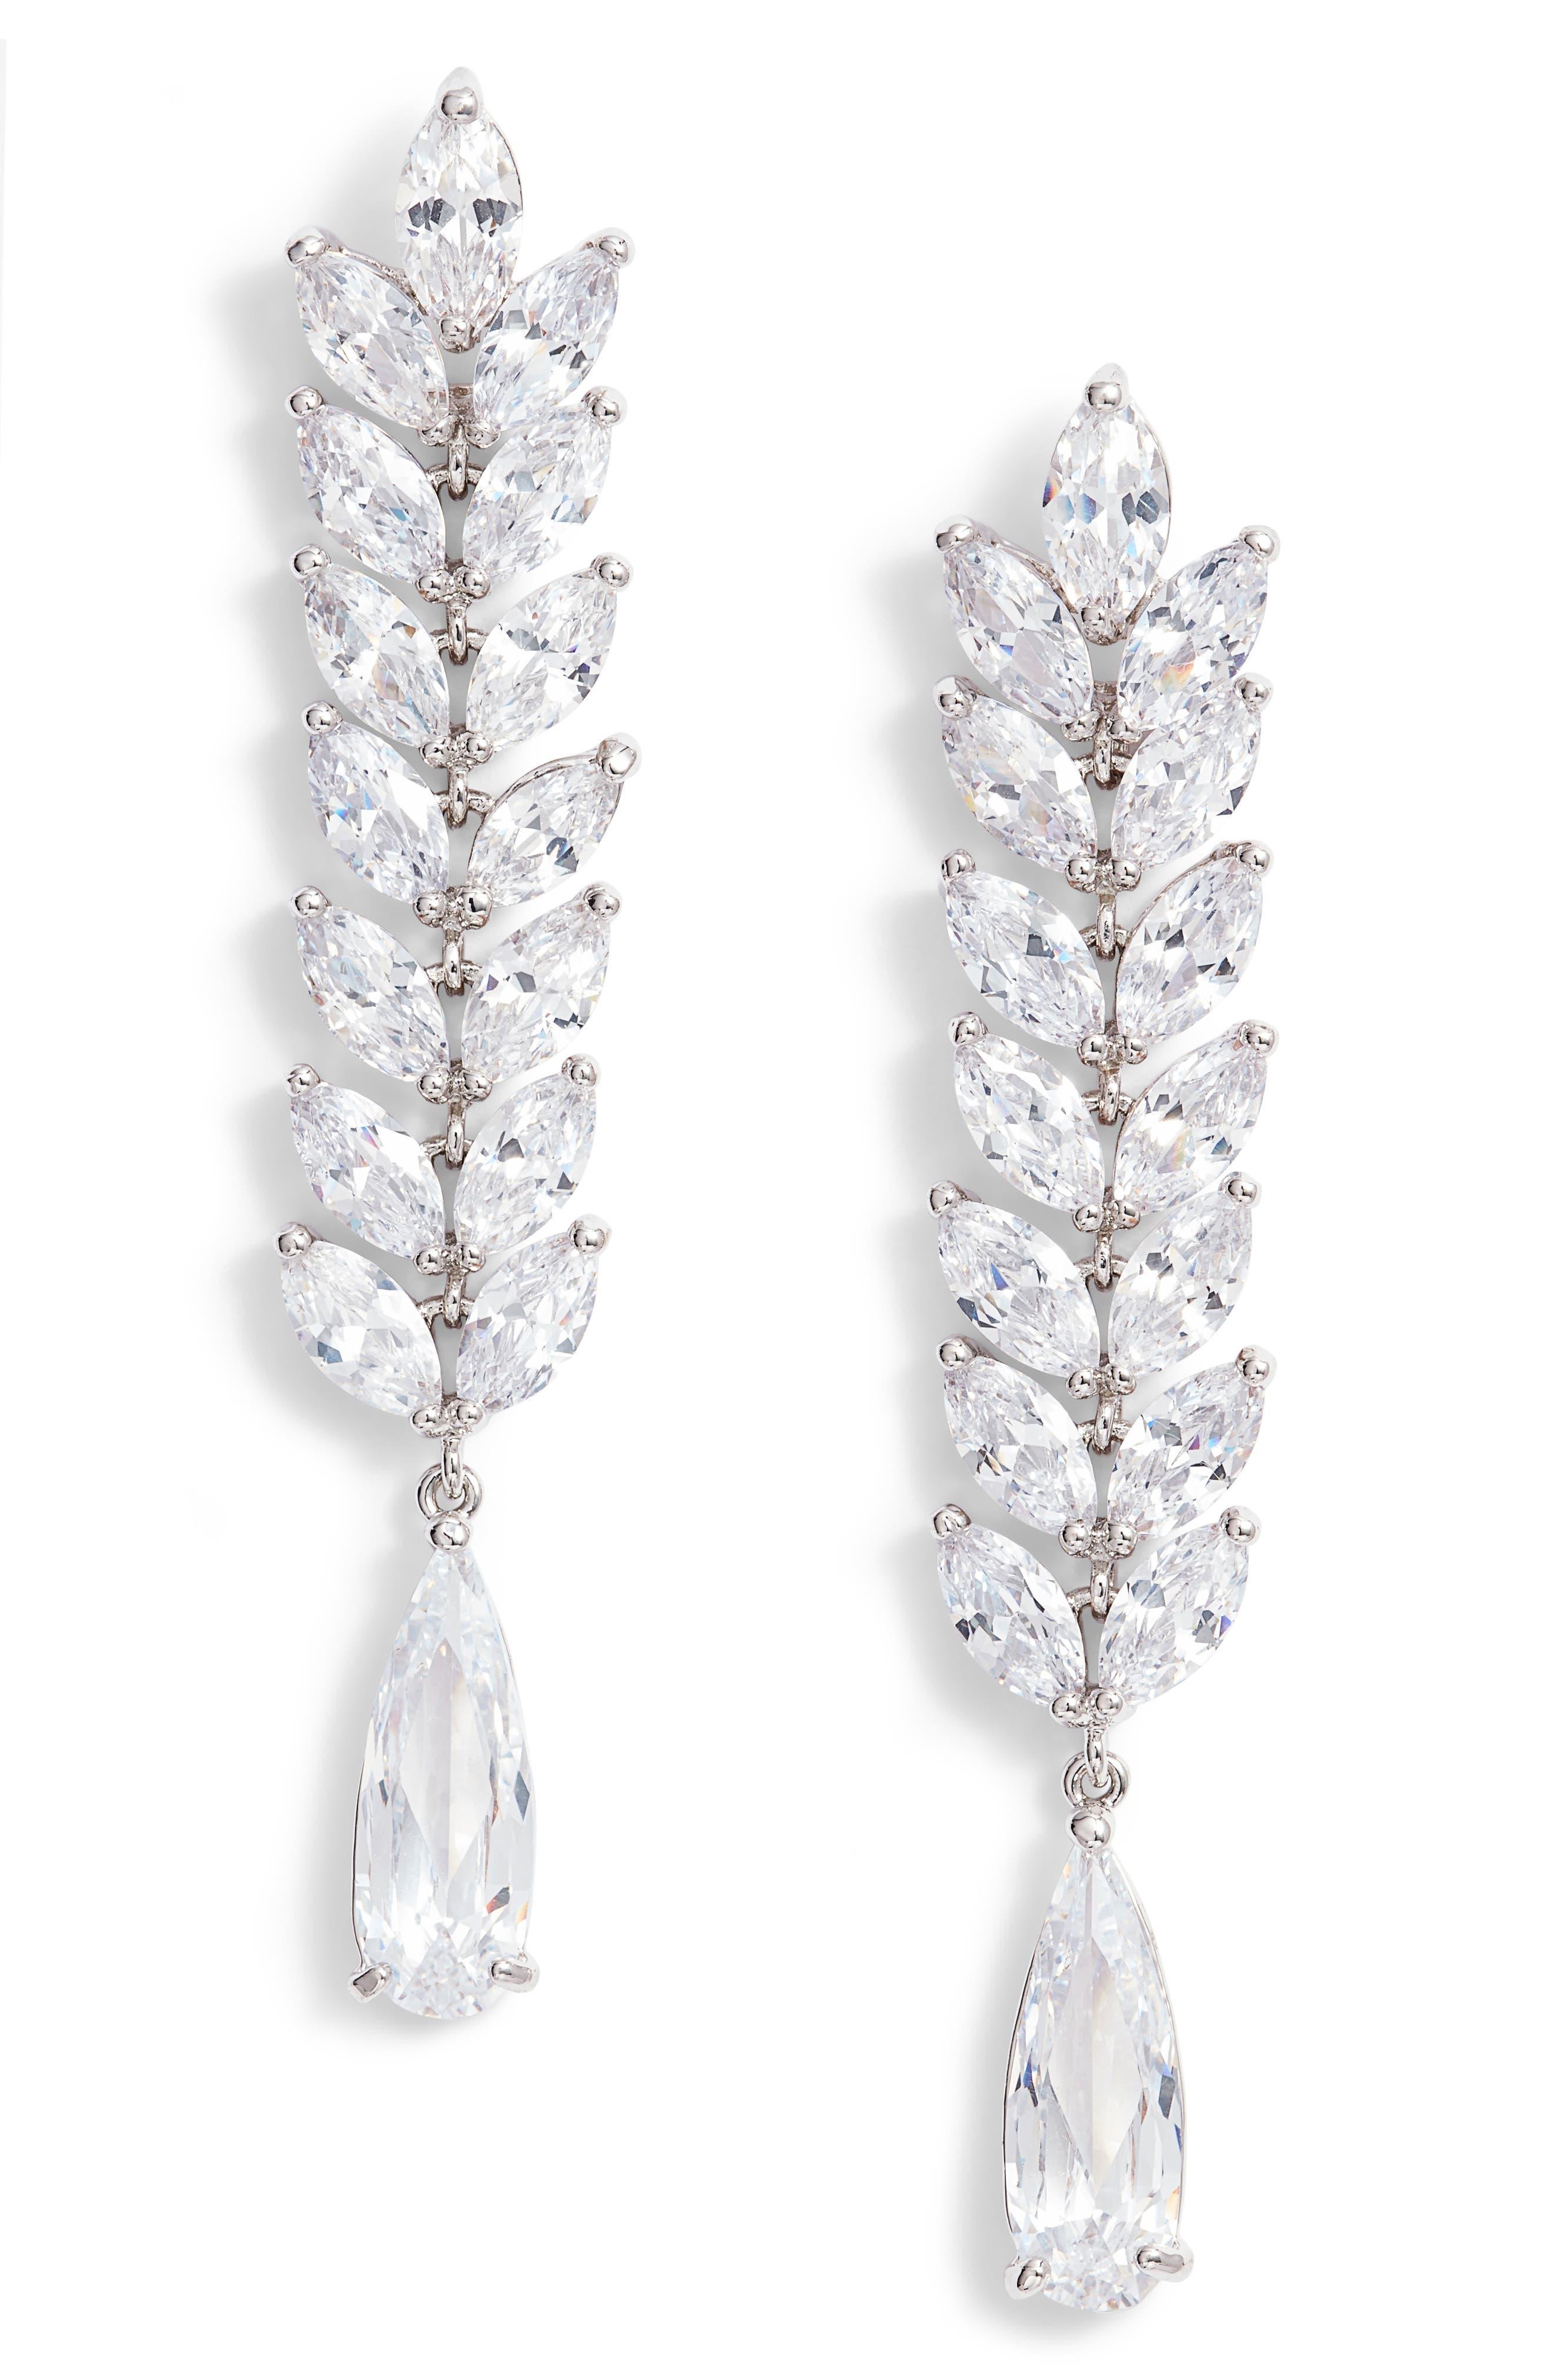 Cascading Long Drop Earrings,                         Main,                         color, Silver/ White Cz